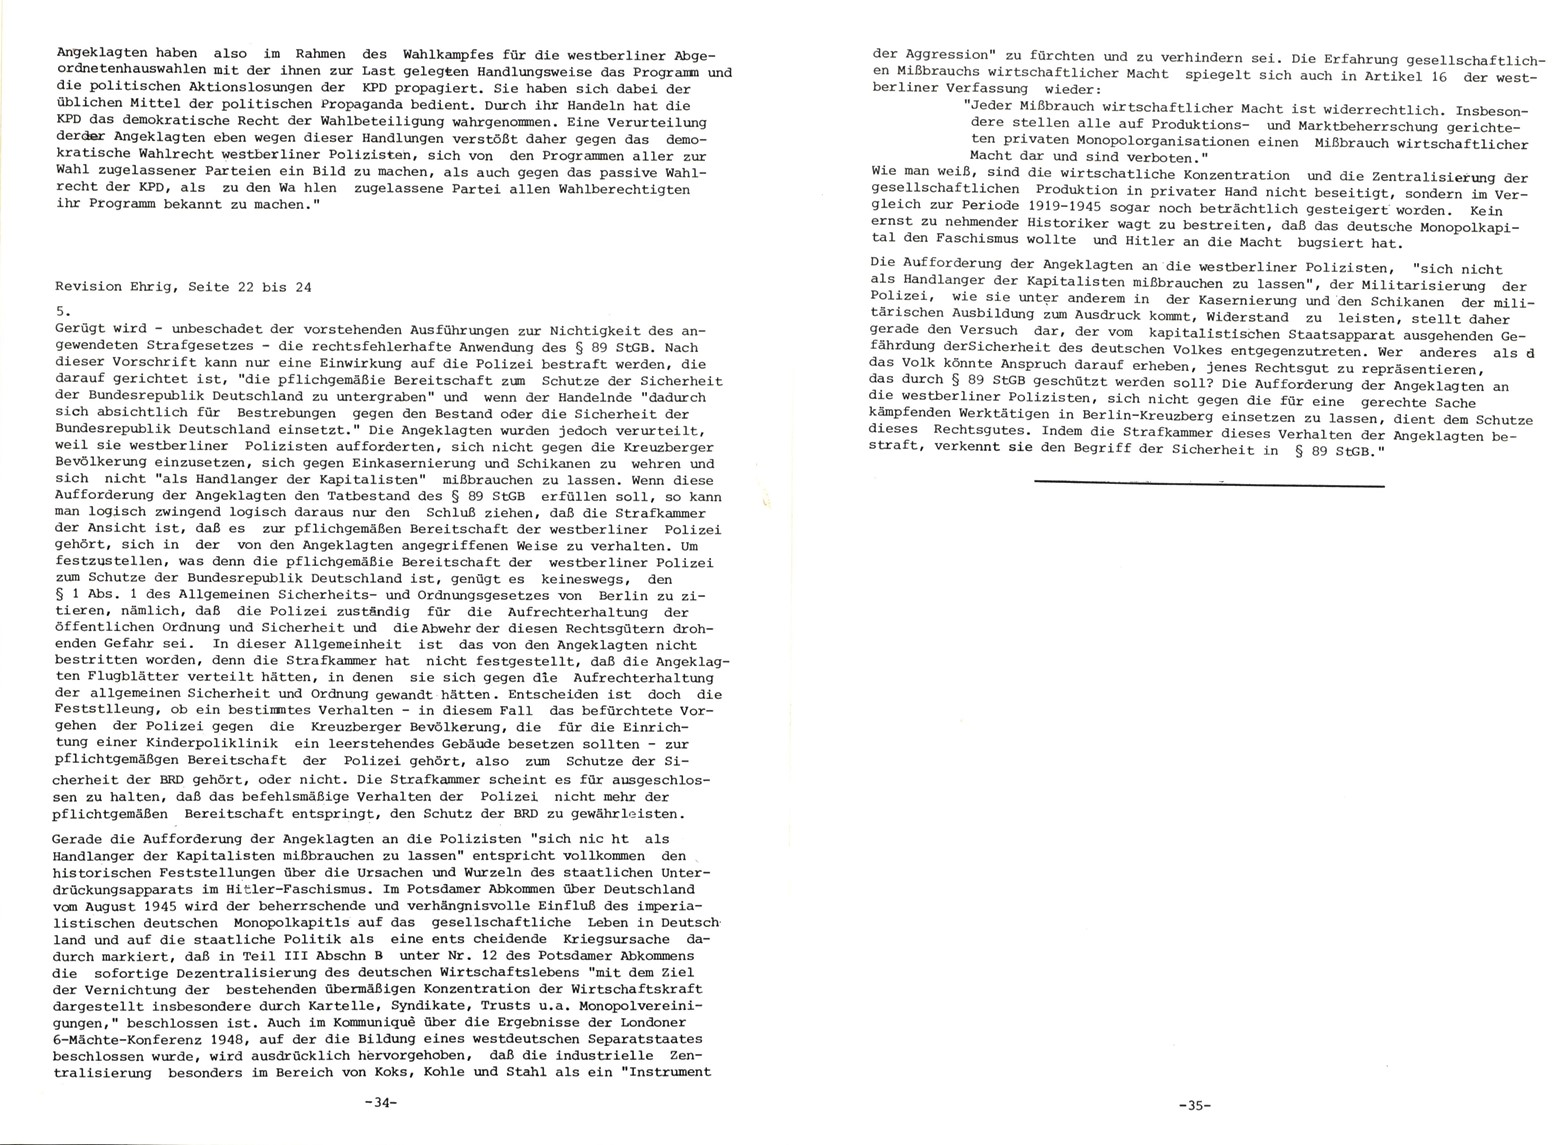 KPDAO_1976_Staatsschutzparagrafen_18